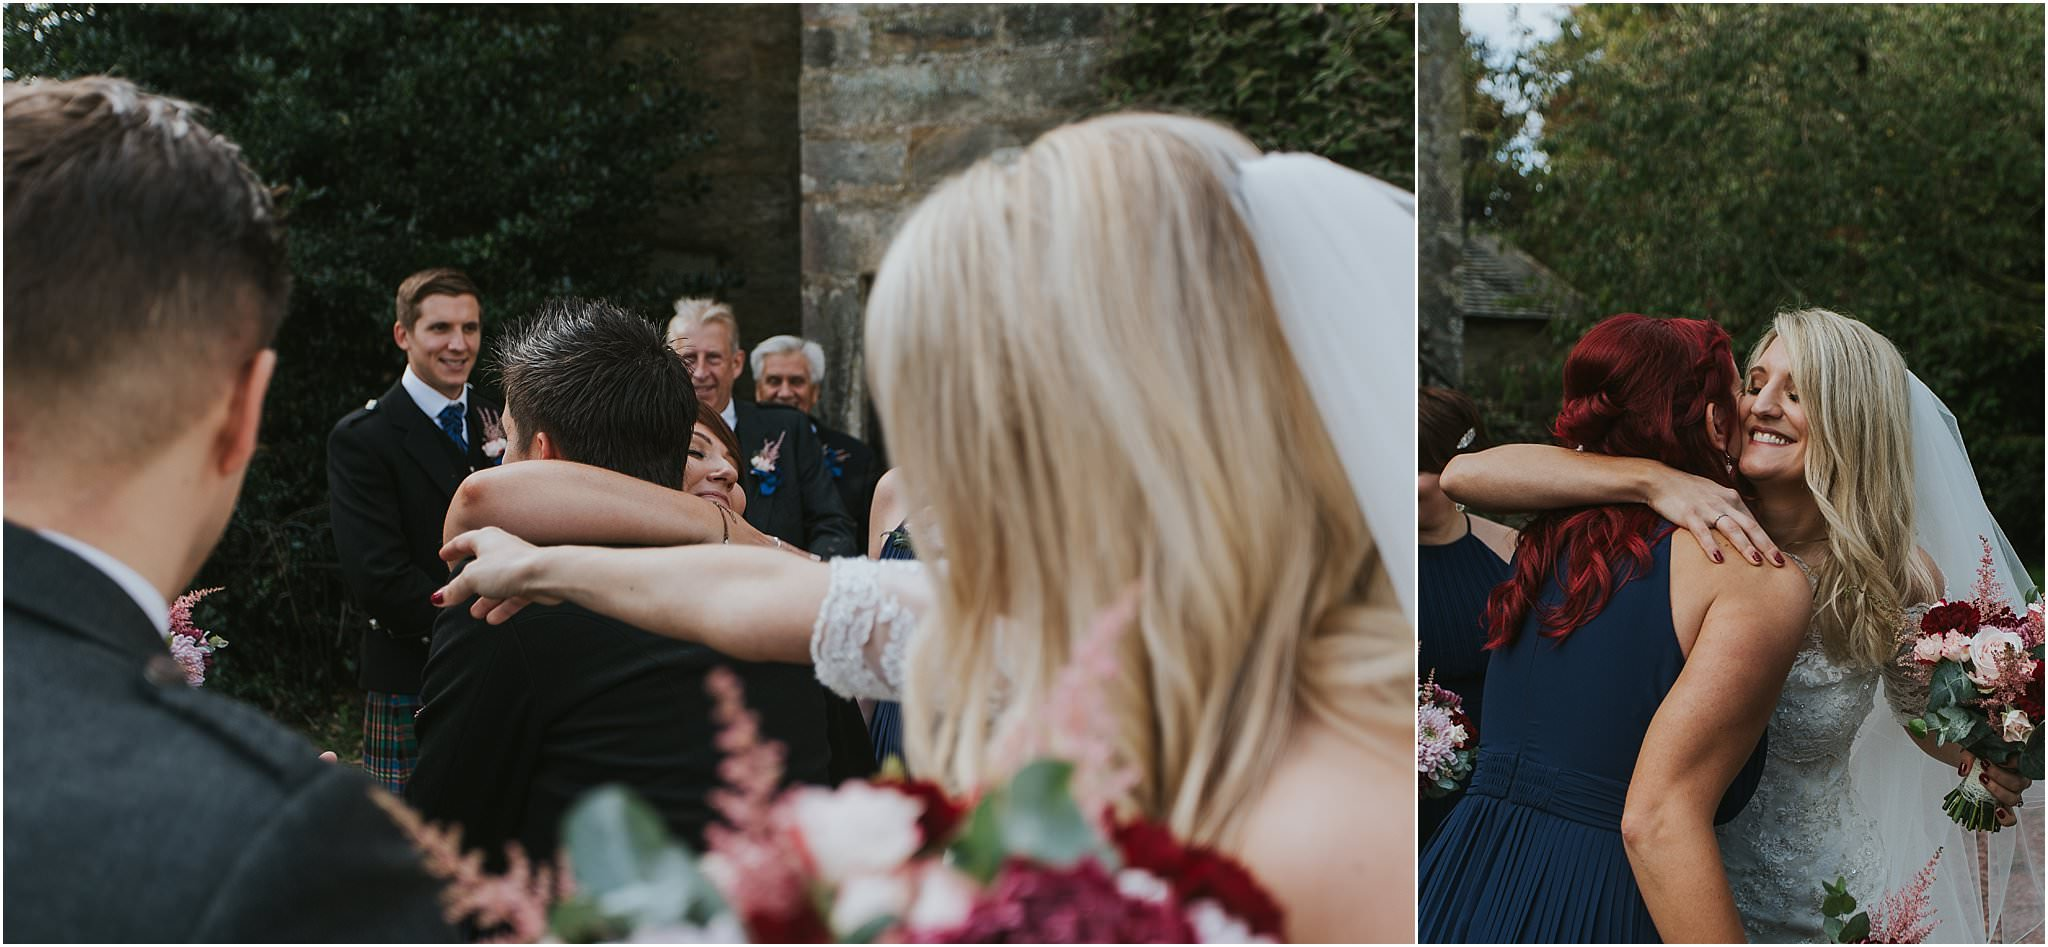 janie-garry-wedding24.jpg